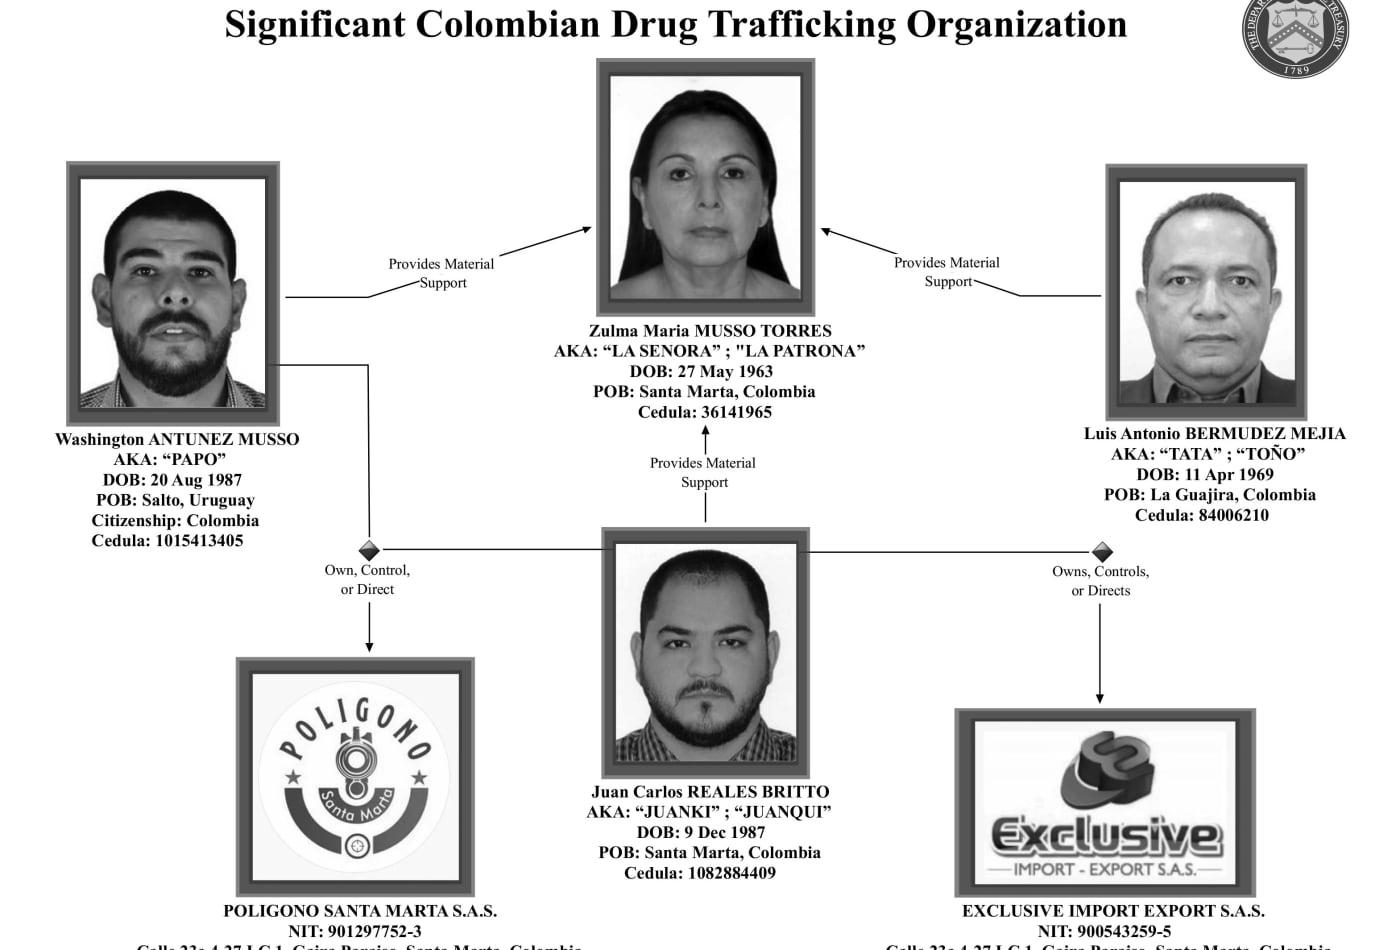 Treasury sanctions Colombian drug trafficking queen 'La Patrona'